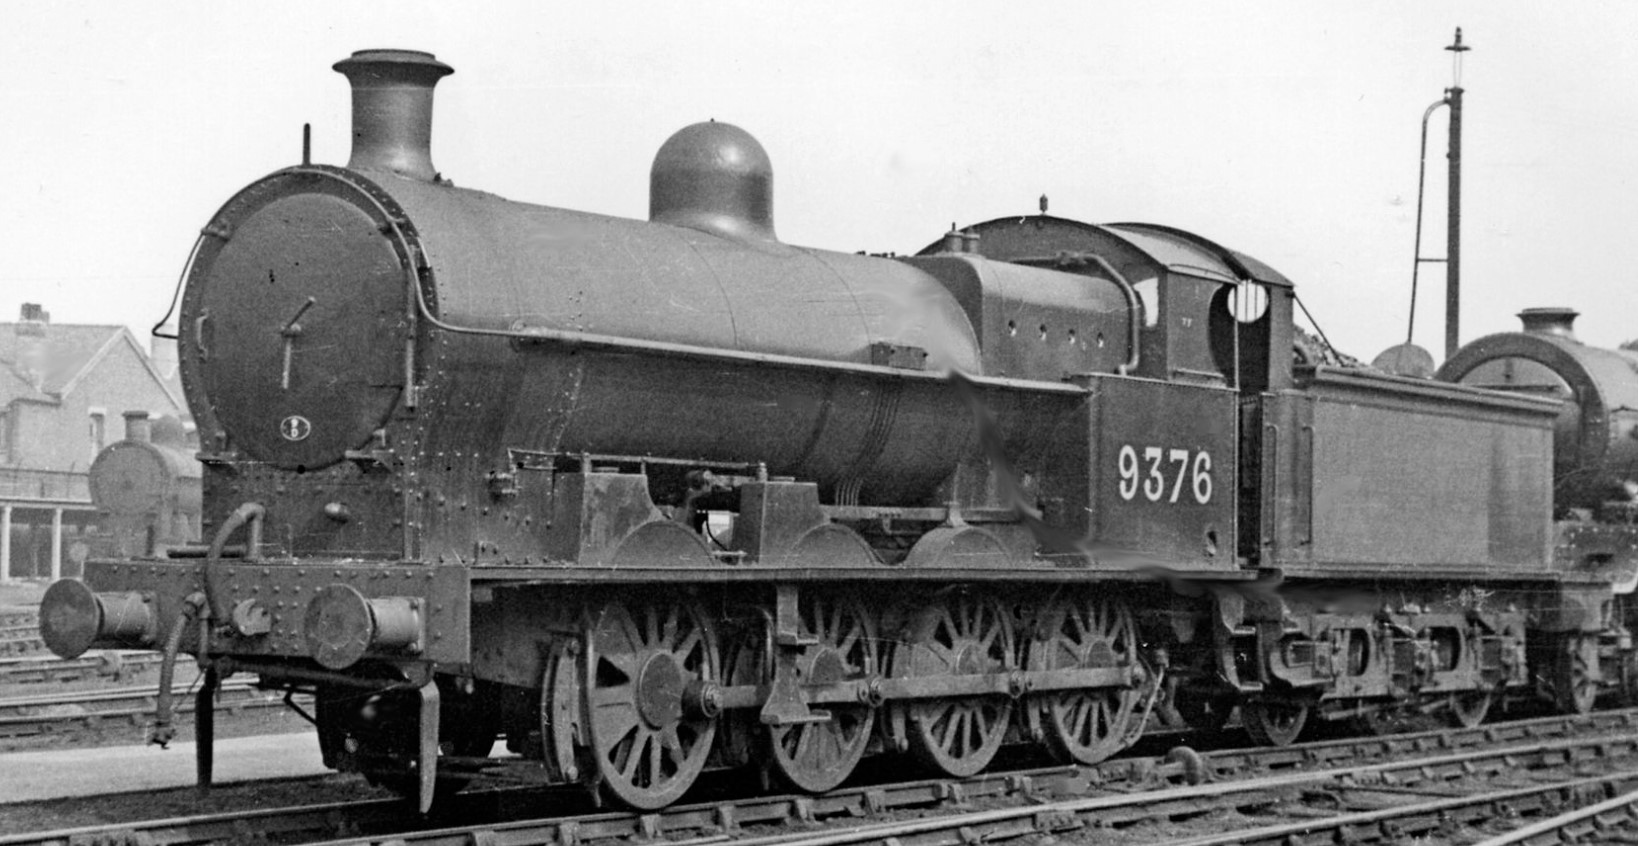 9376 at Crewe Works in May 1948. ©Ben Brooksbank